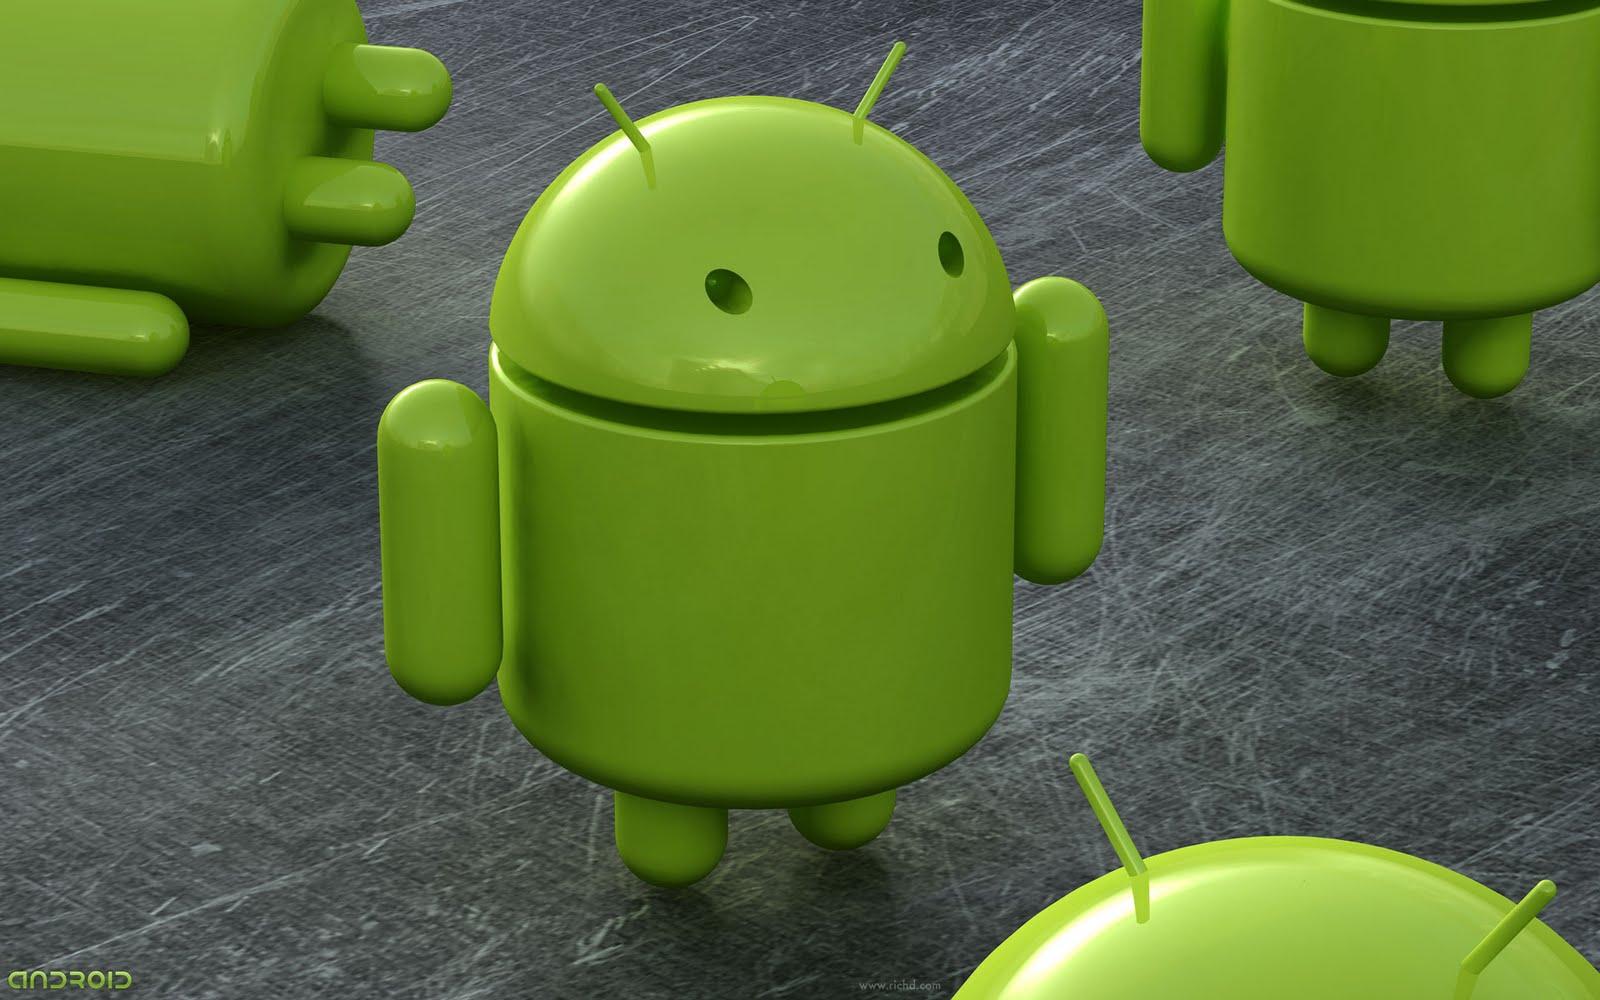 http://4.bp.blogspot.com/-46TZ3tMhRAk/TWY06ZxKTDI/AAAAAAAAAC4/bDinoYL2oNc/s1600/Android%2BWallpaper%2B123.jpg